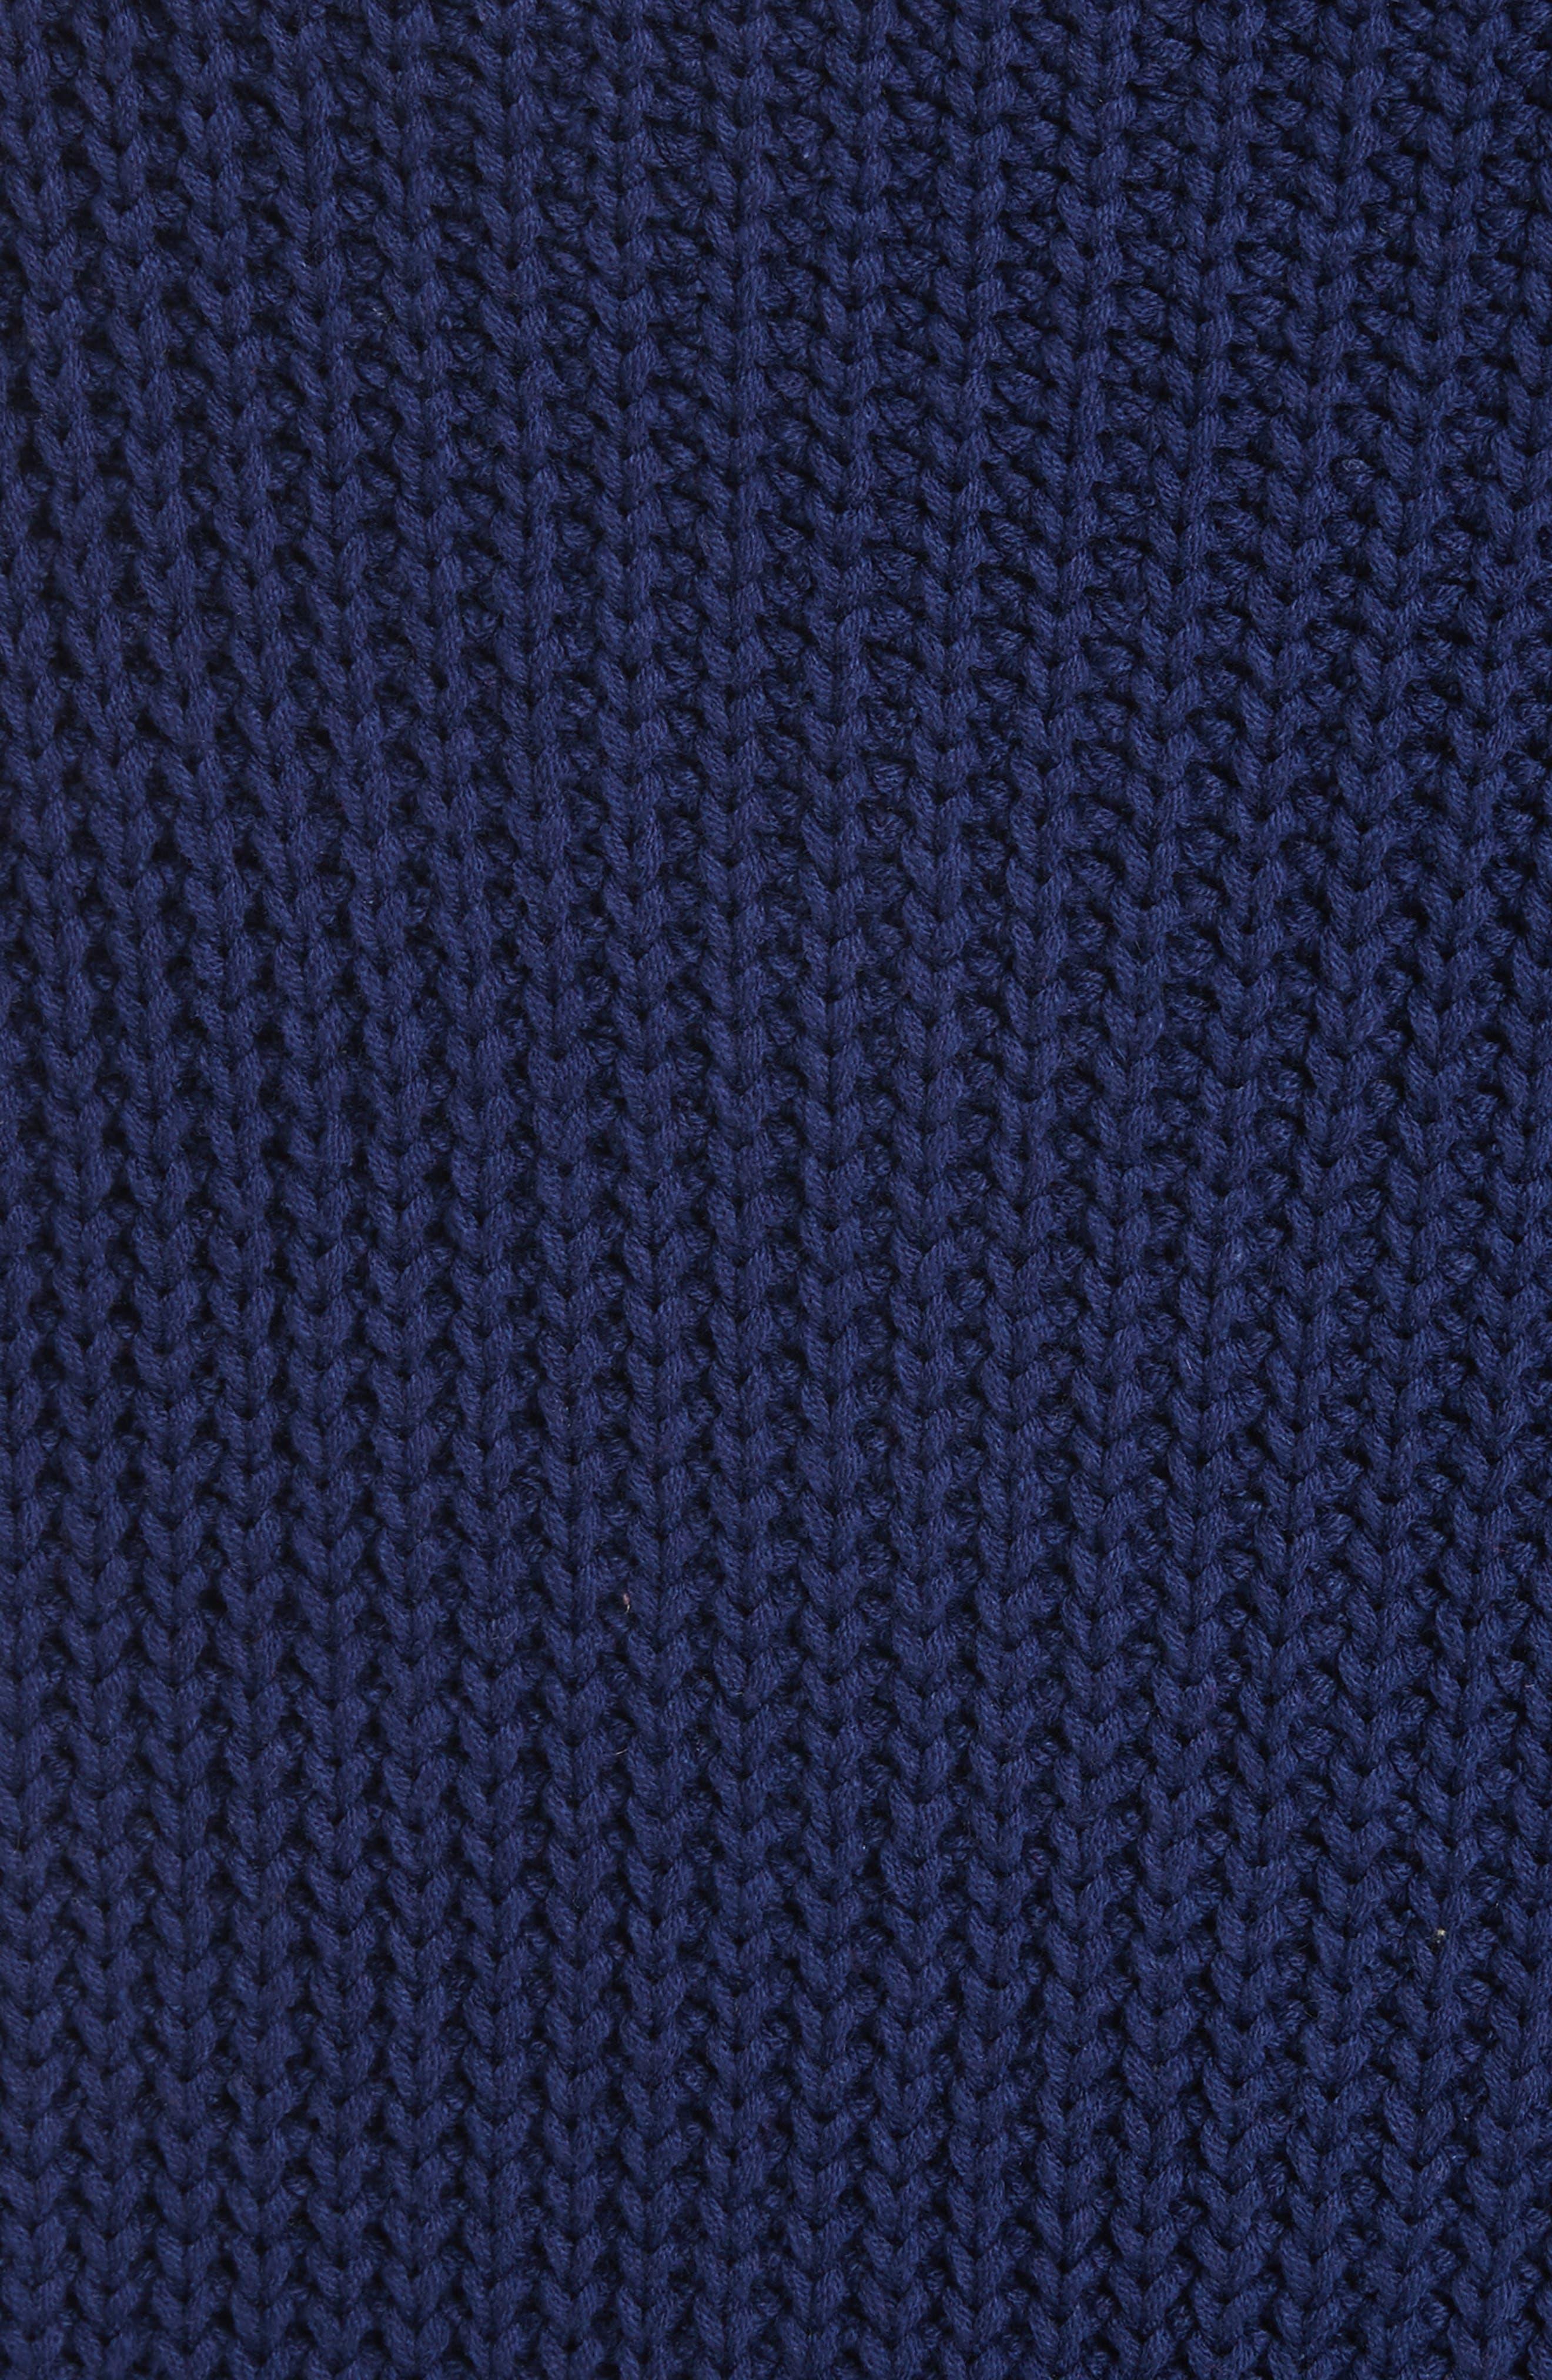 Swim Too Deep Turtleneck Sweater,                             Alternate thumbnail 23, color,